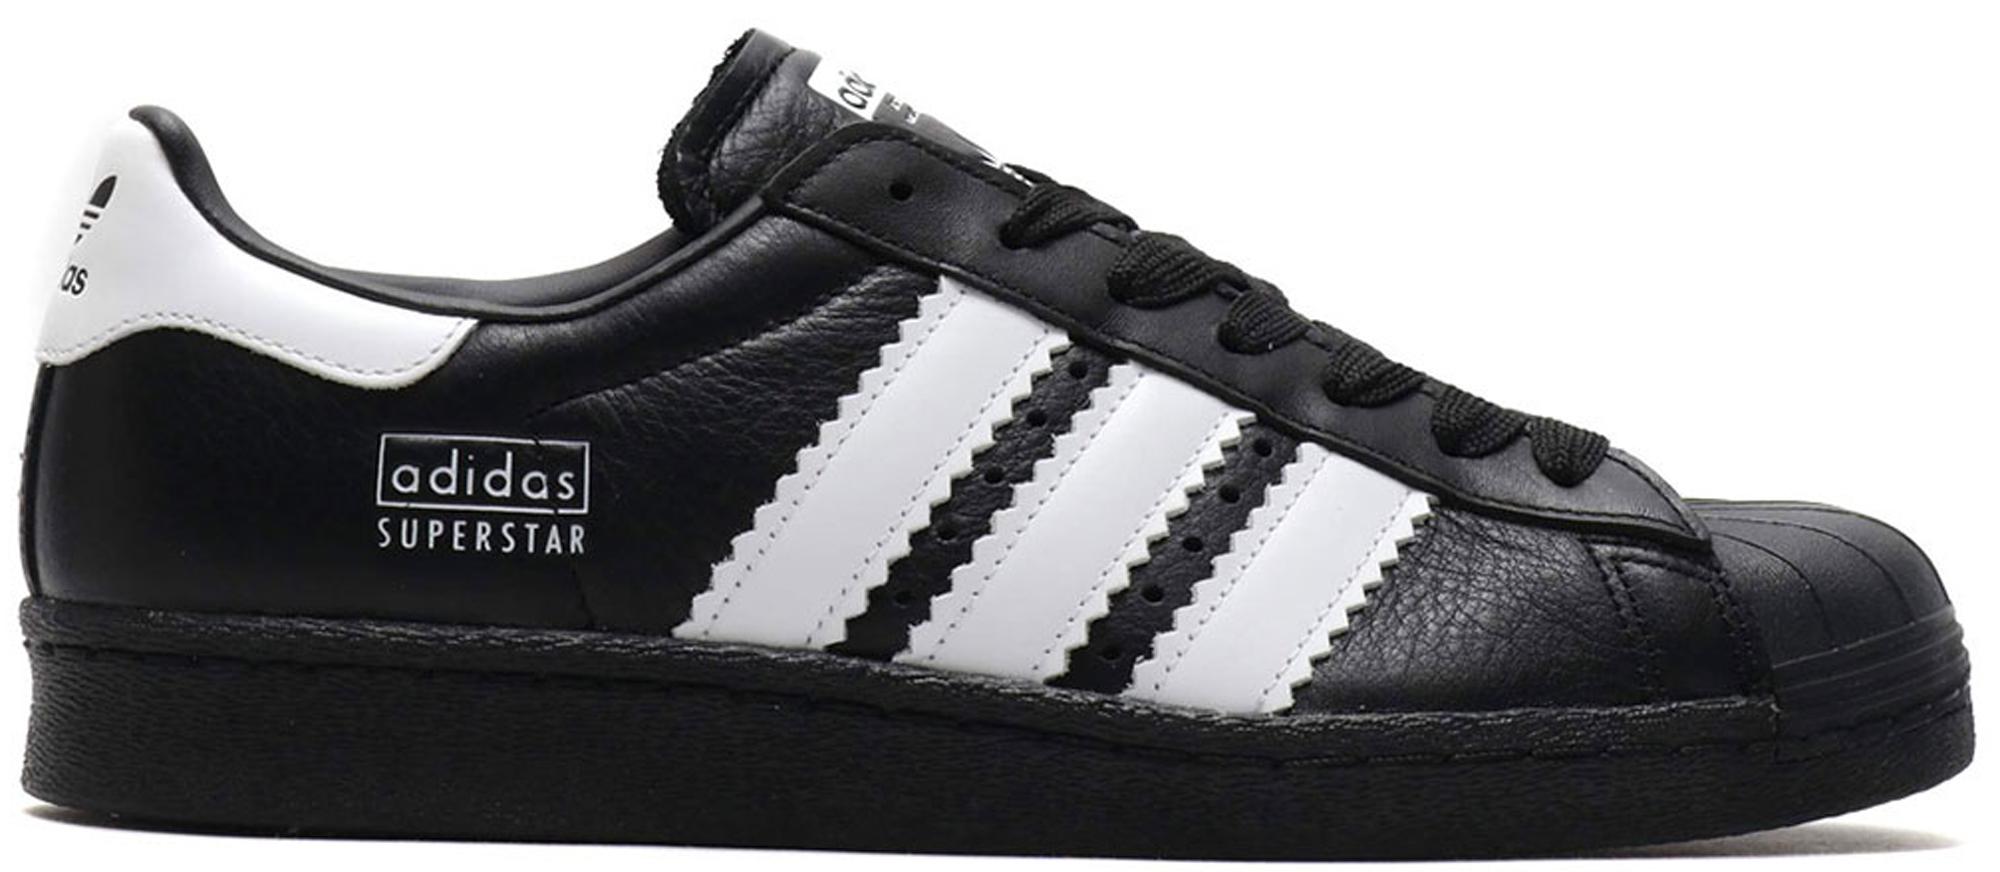 adidas Superstar 80s Enlarged Stripes Black